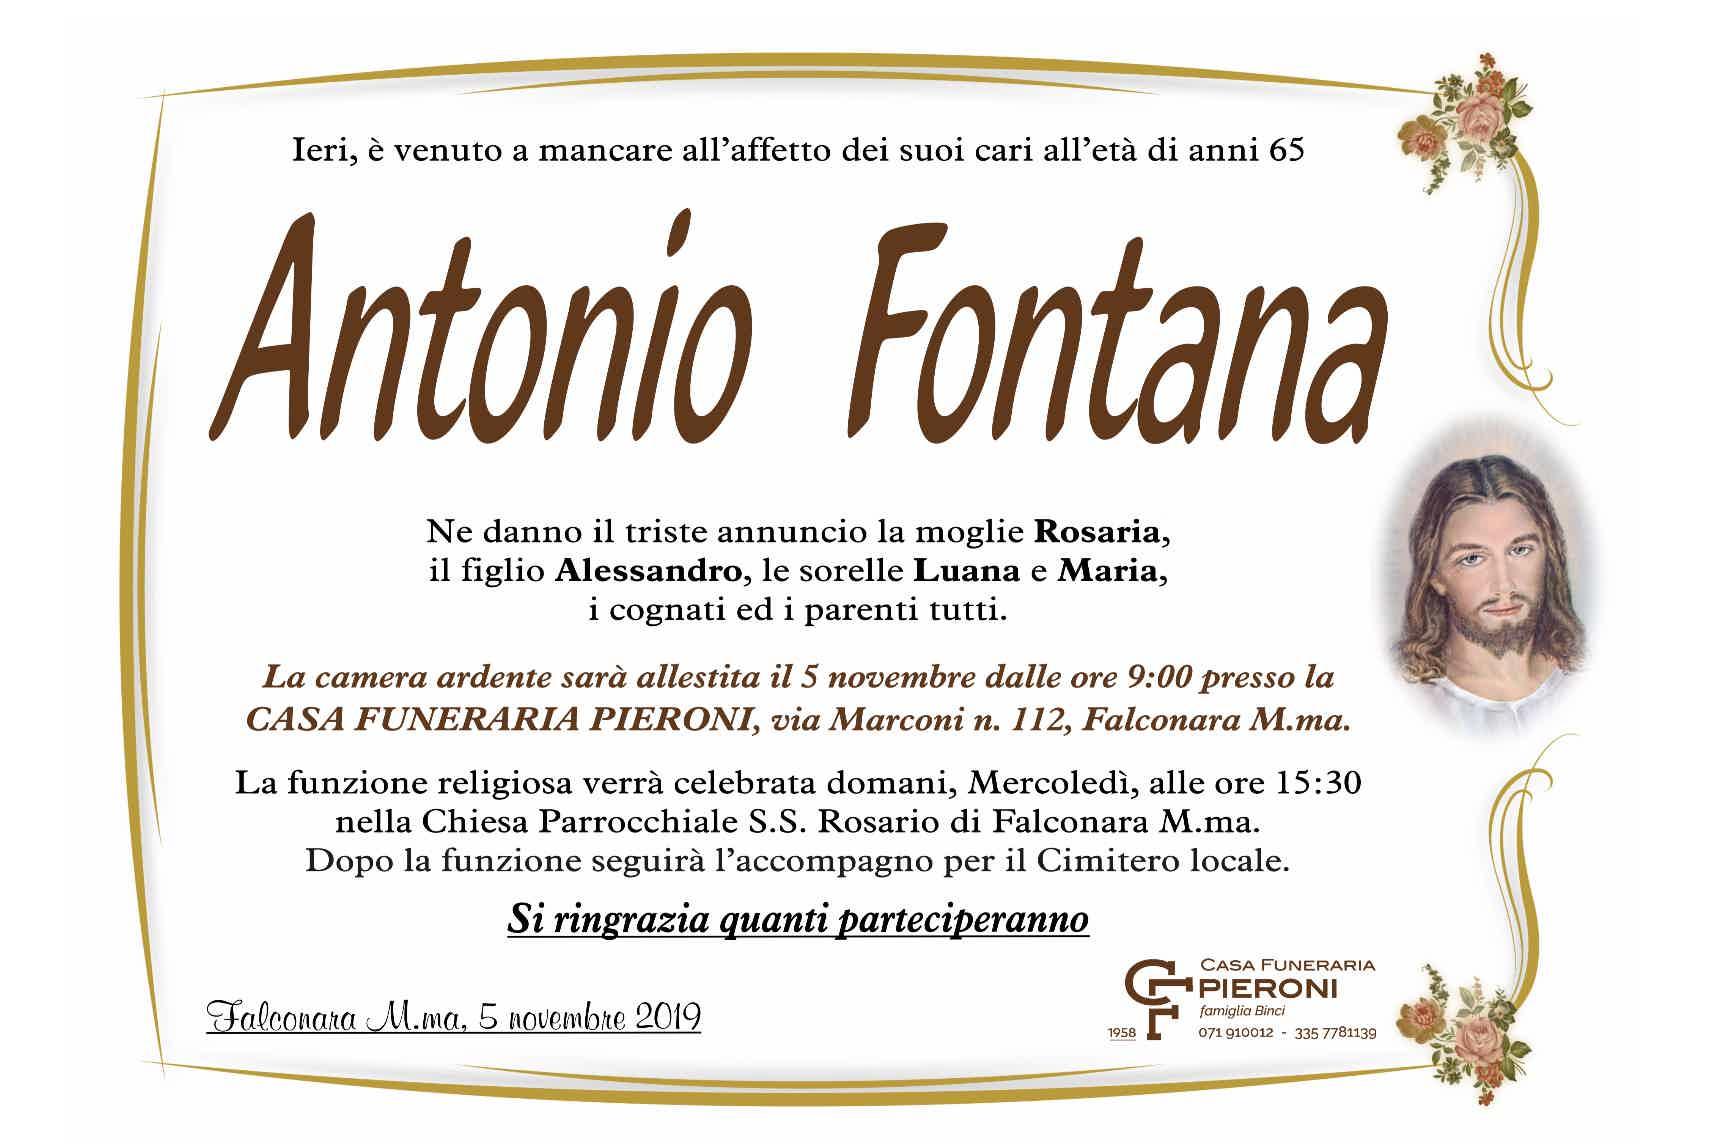 Antonio Fontana